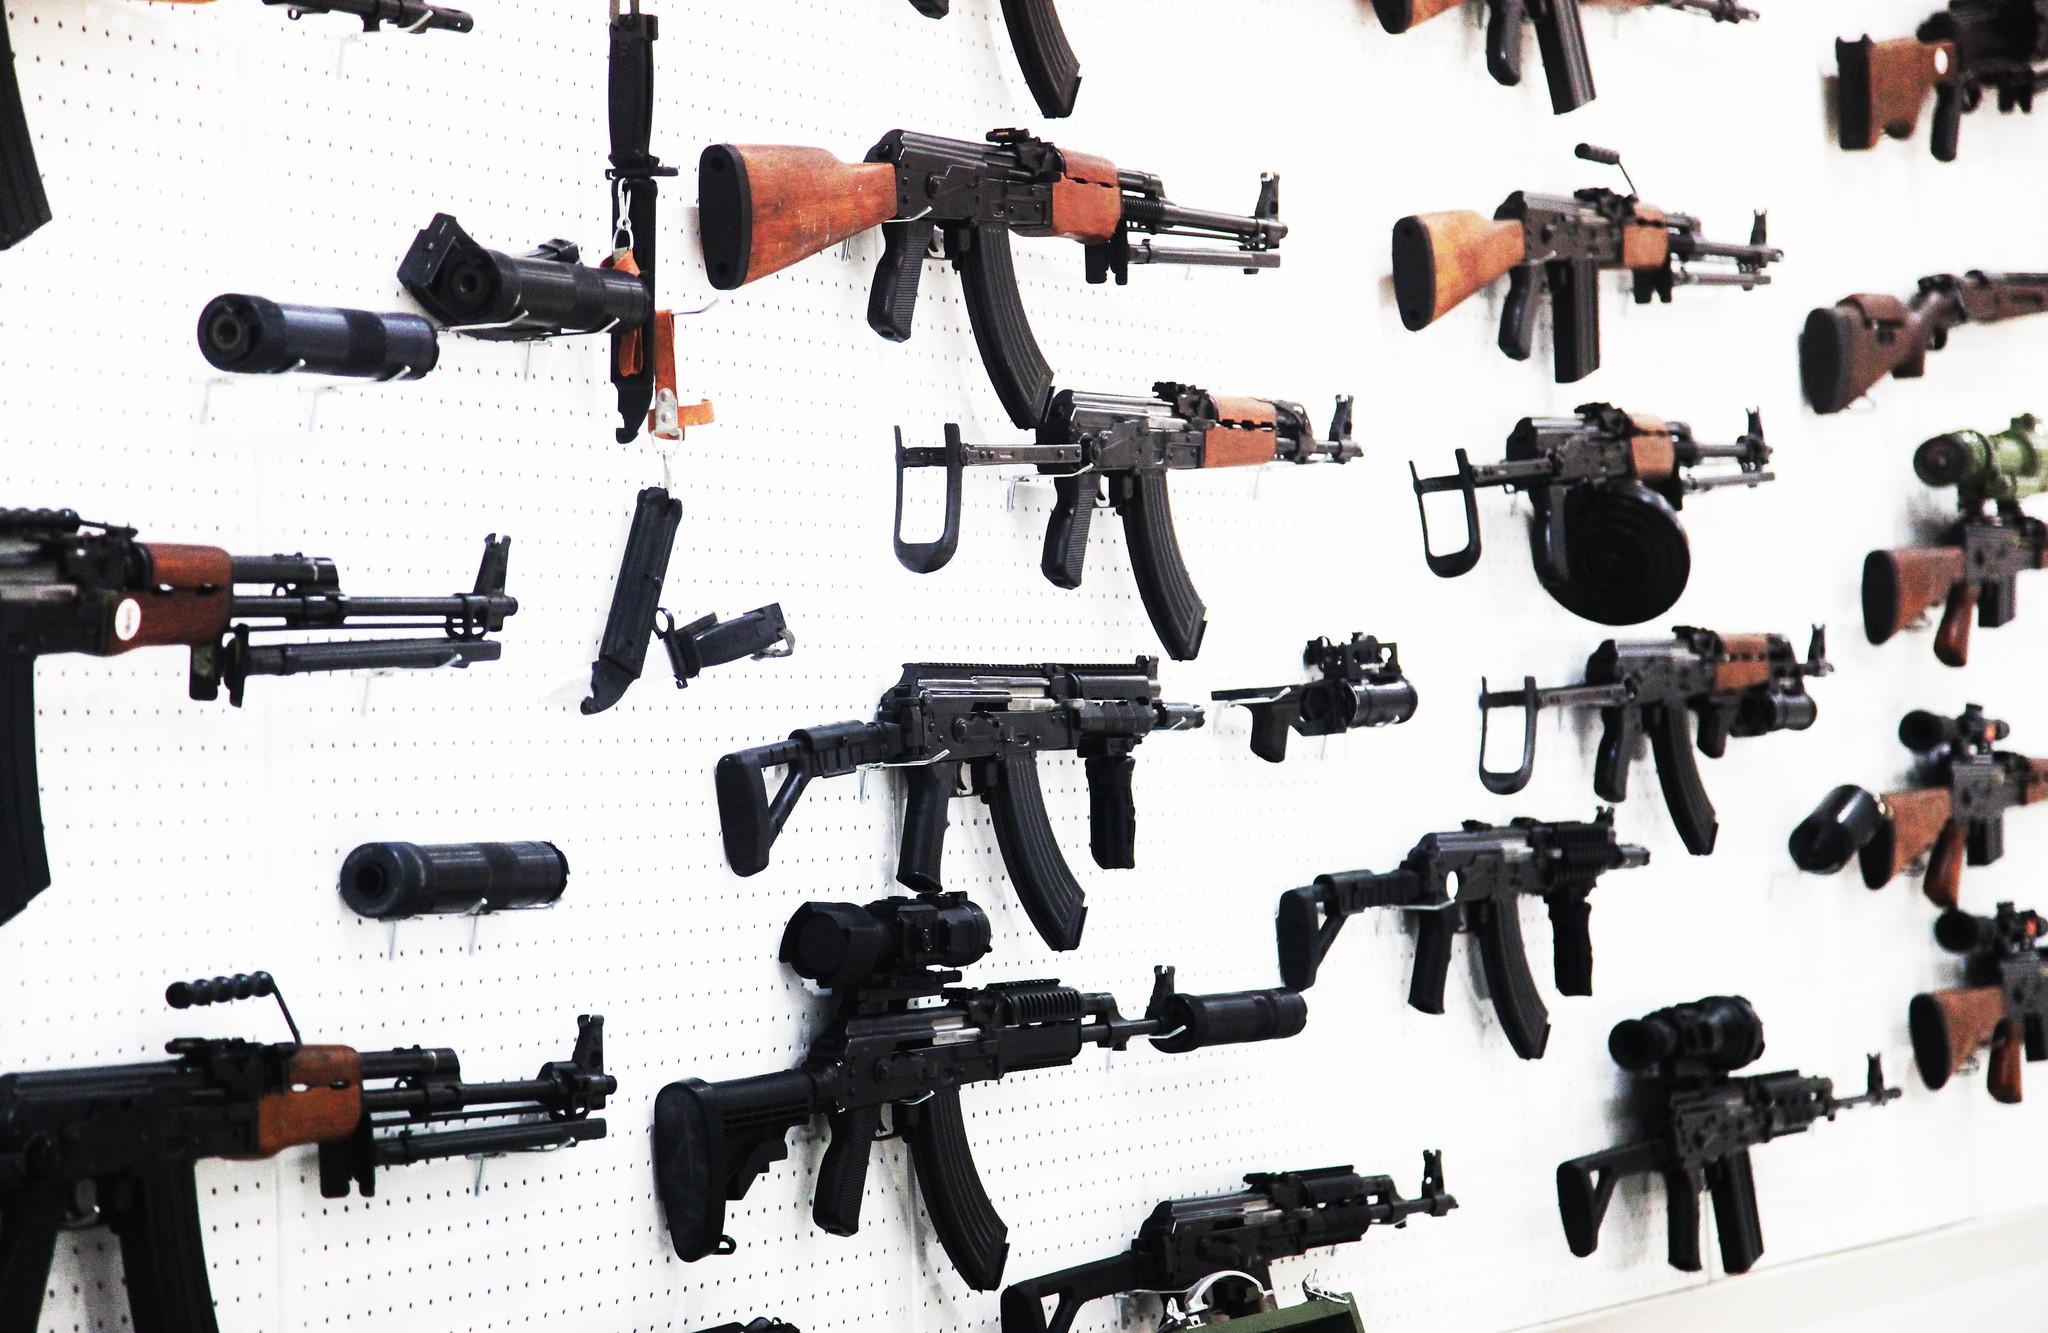 Gun stores can keep selling during coronavirus lockdown in Texas, attorney general says